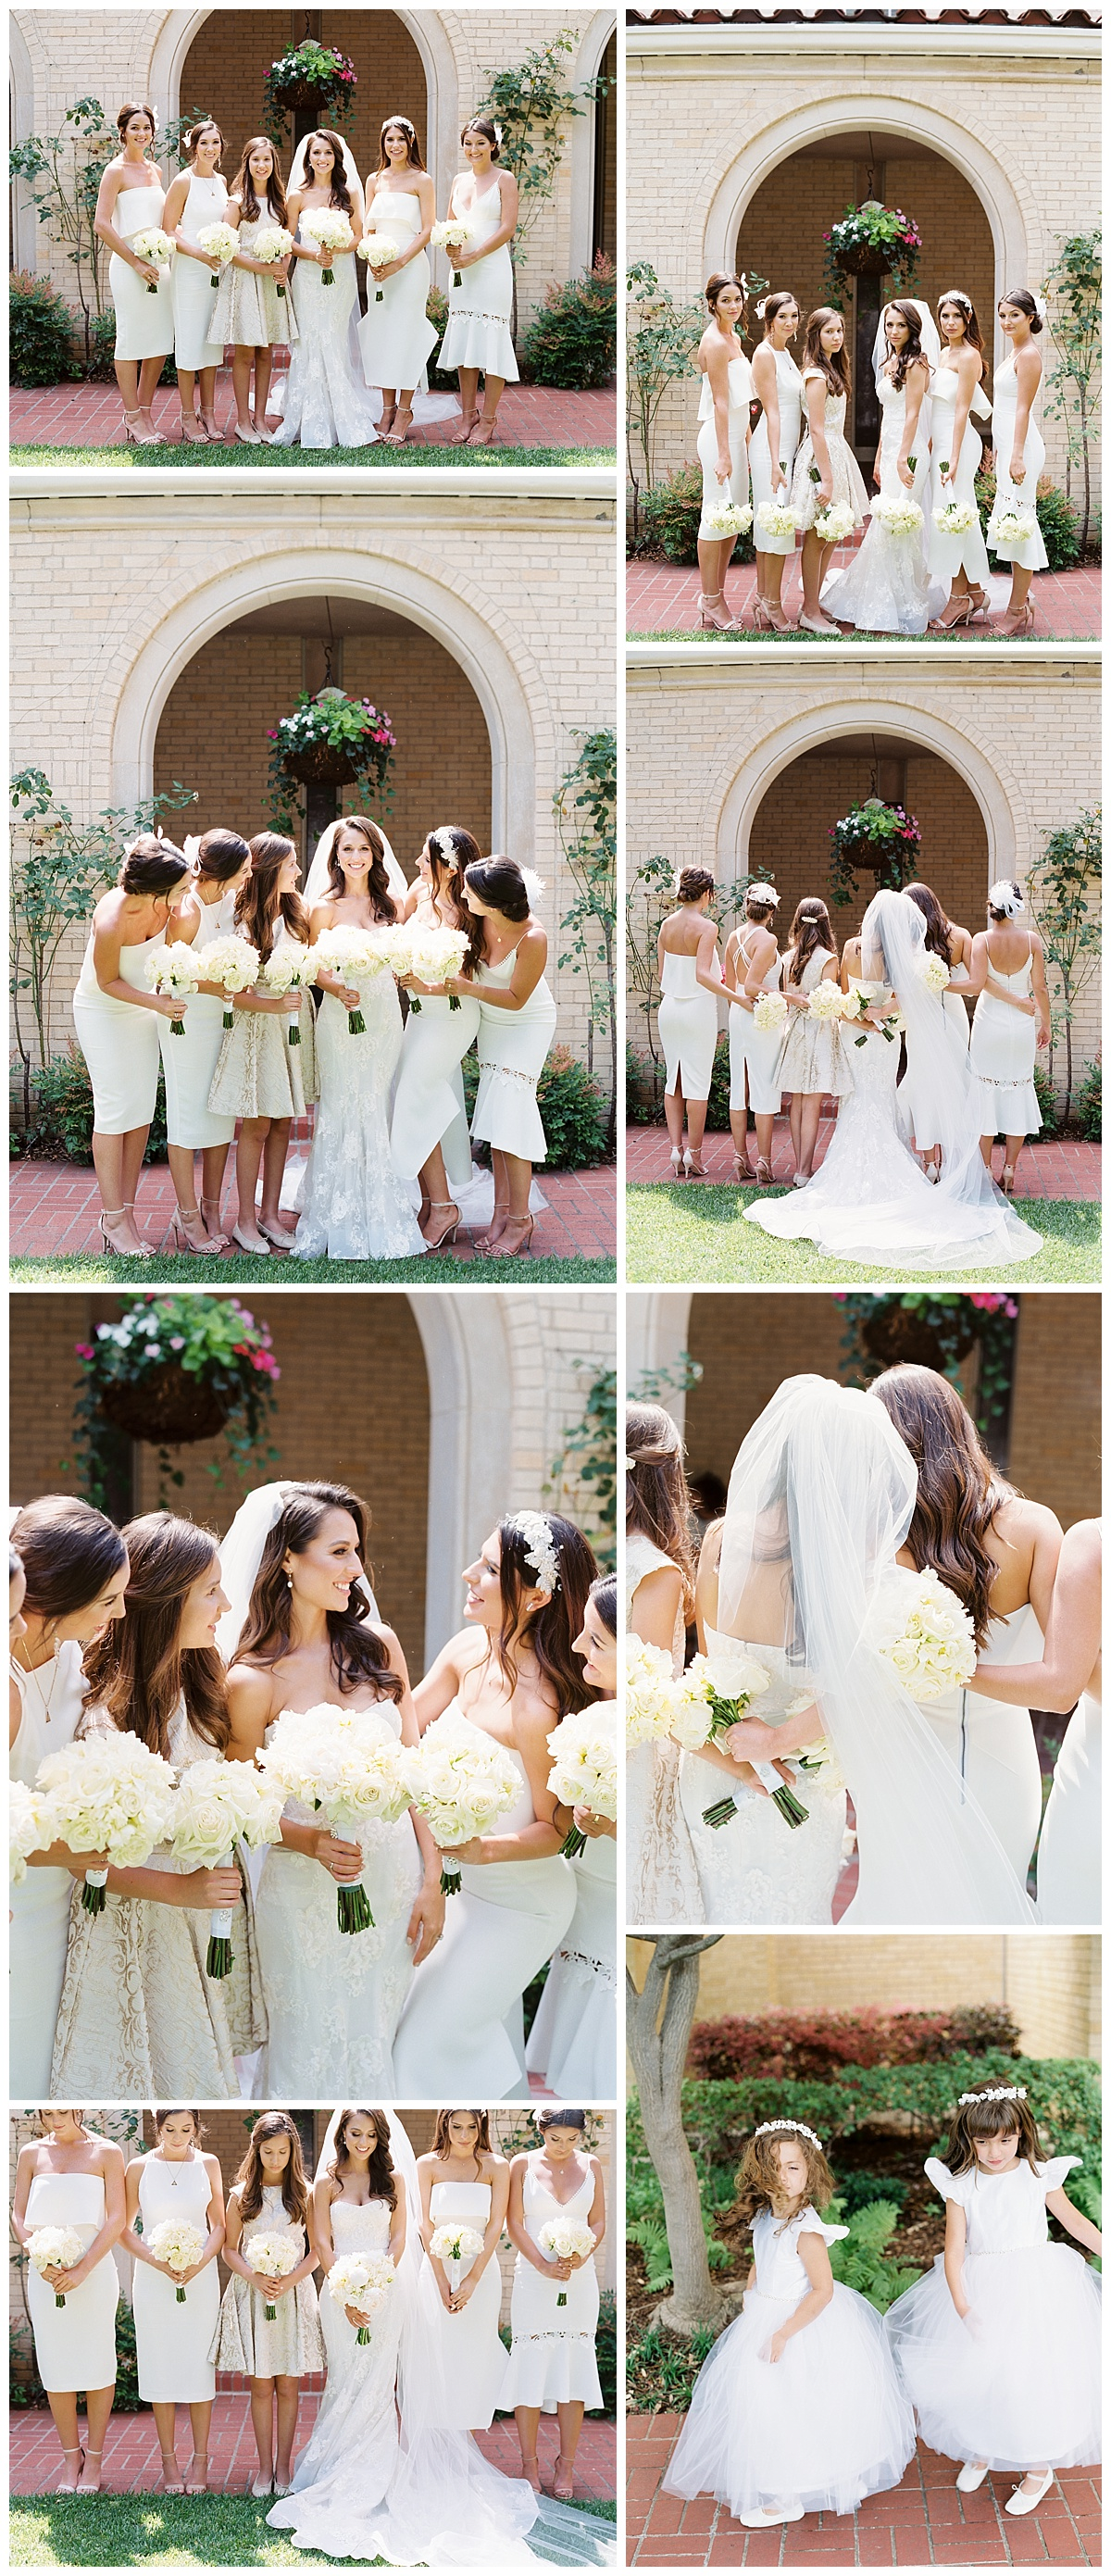 christ-the-king-catholic-church-wedding-ar-photography-2.jpg